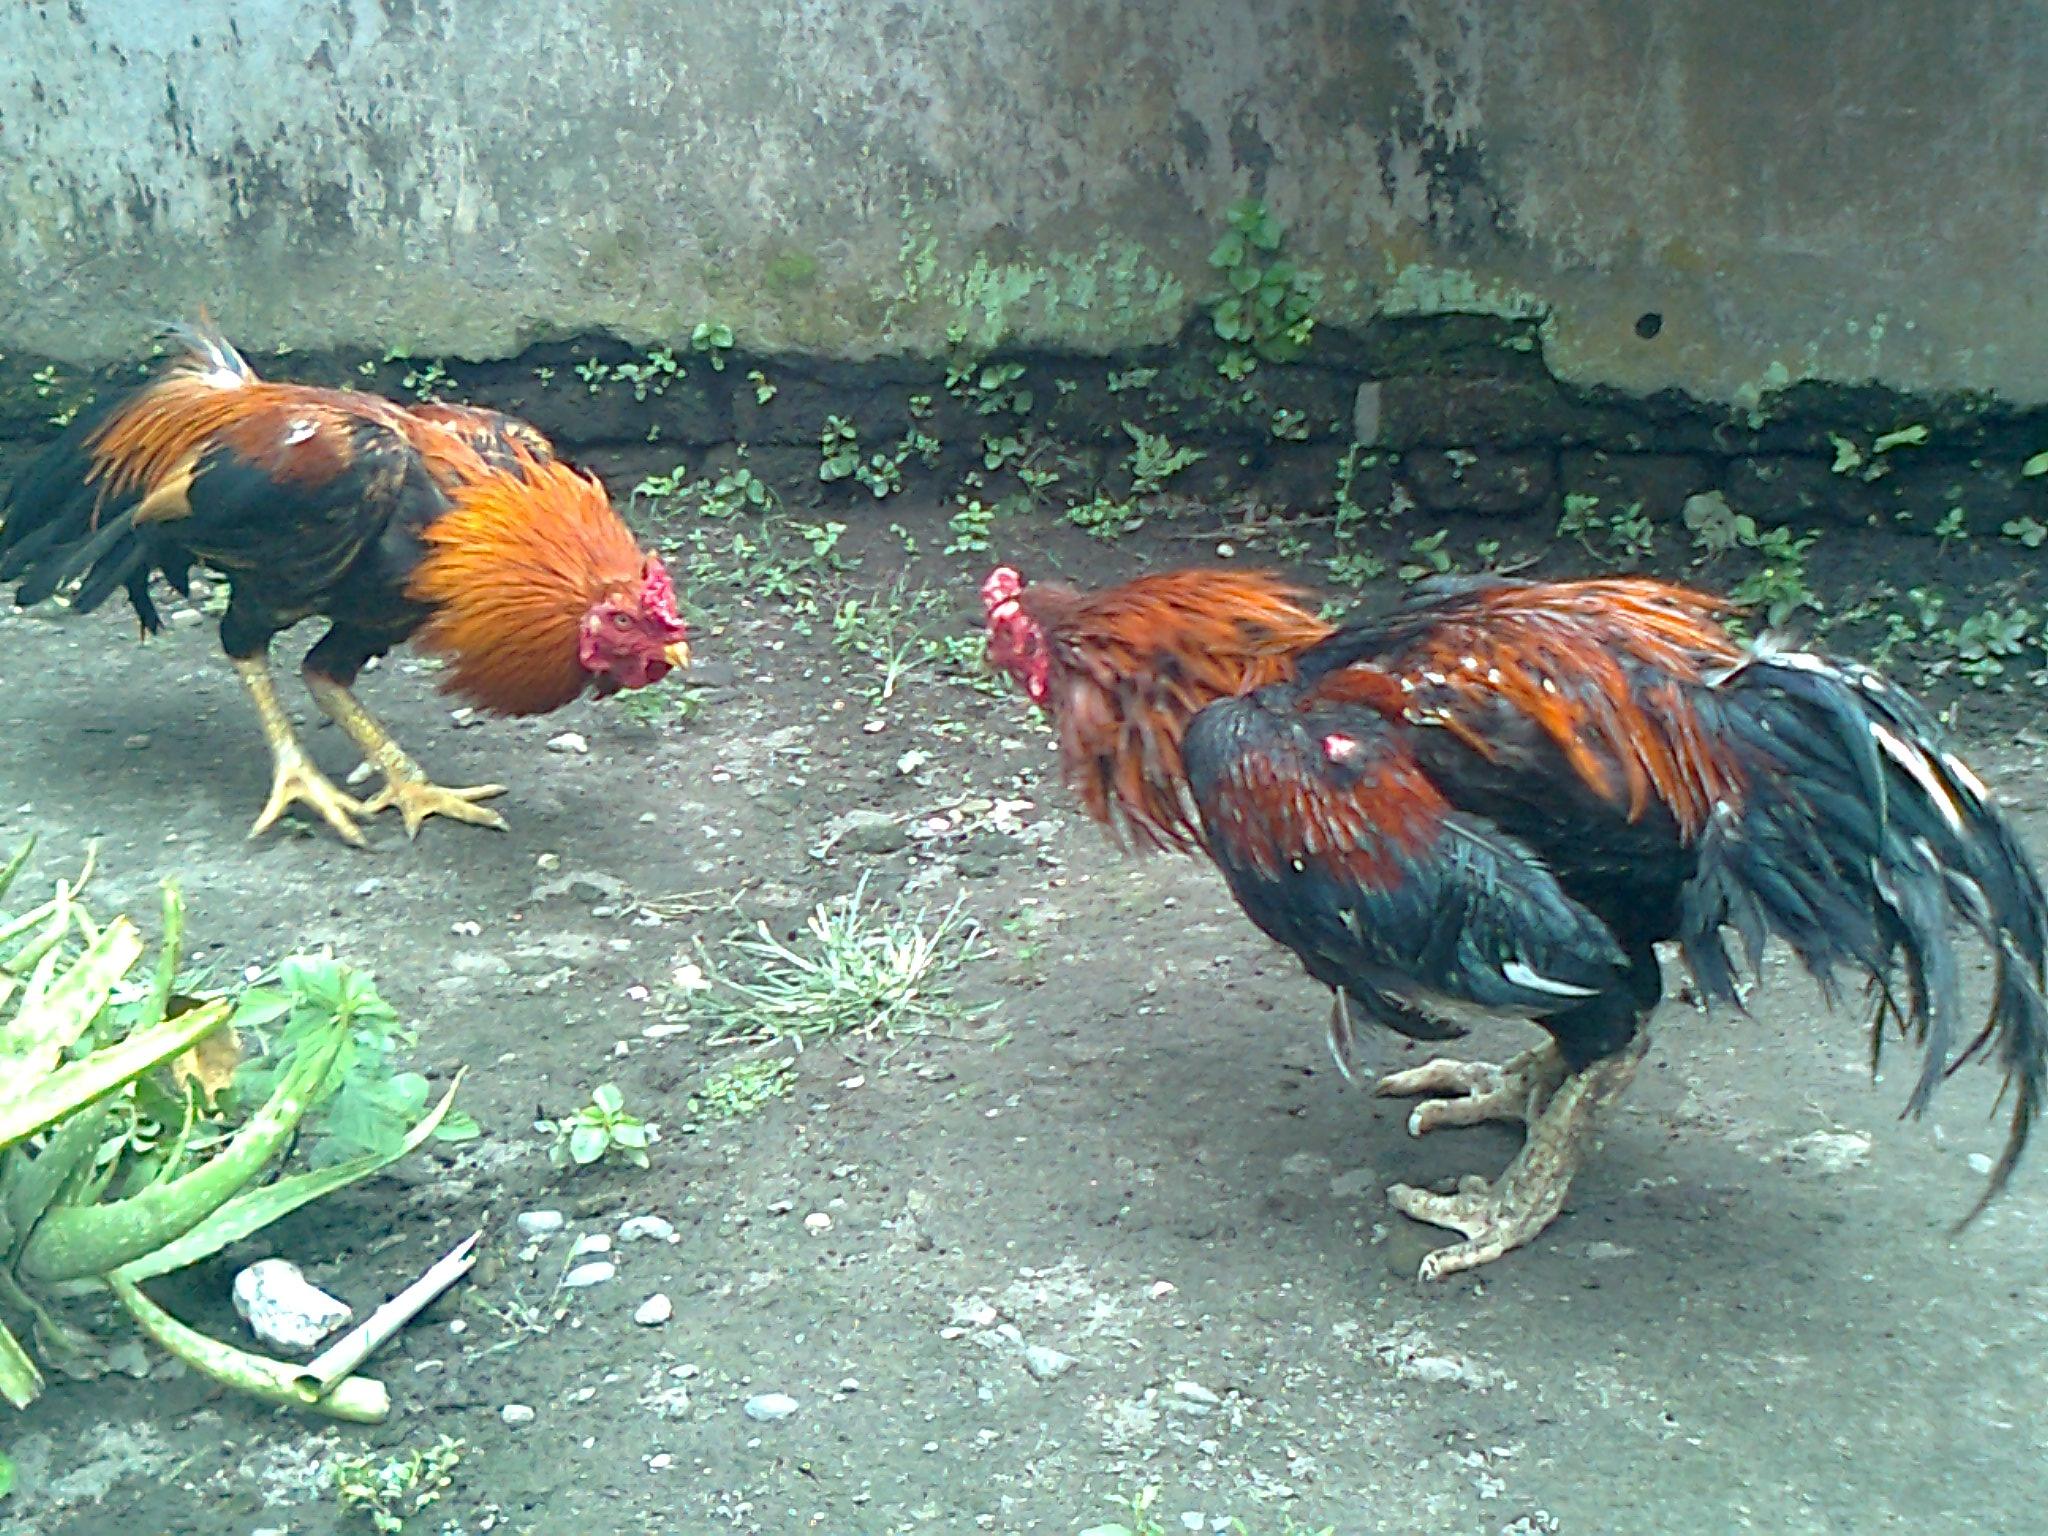 Sabung Ayam Online : Memendekkan/Memotong Jalu